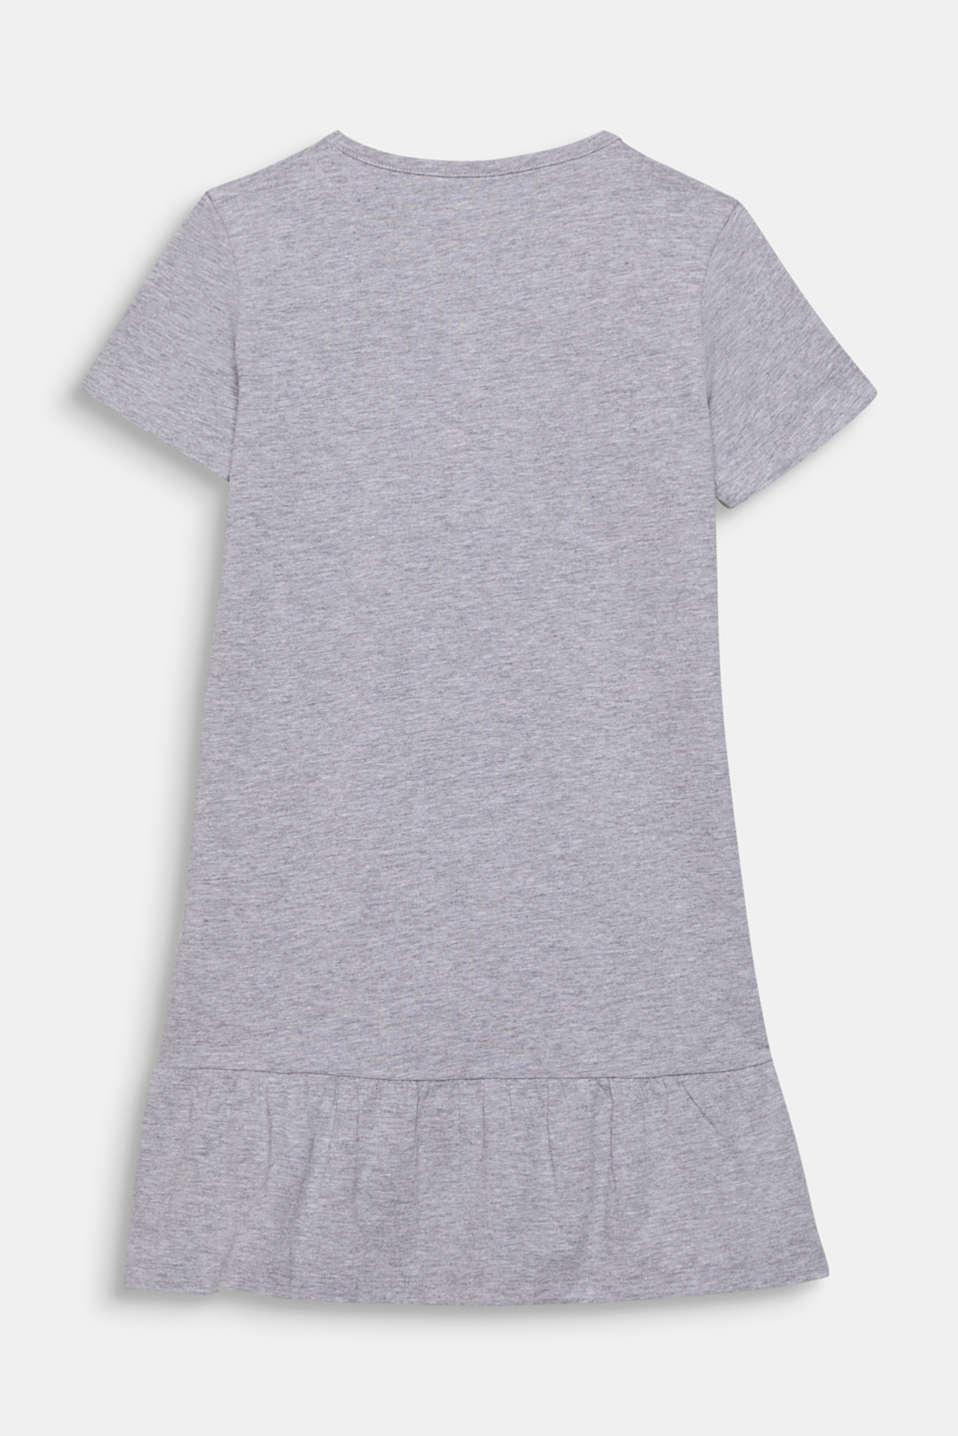 Melange jersey nightshirt with a print, LIGHT GREY, detail image number 1